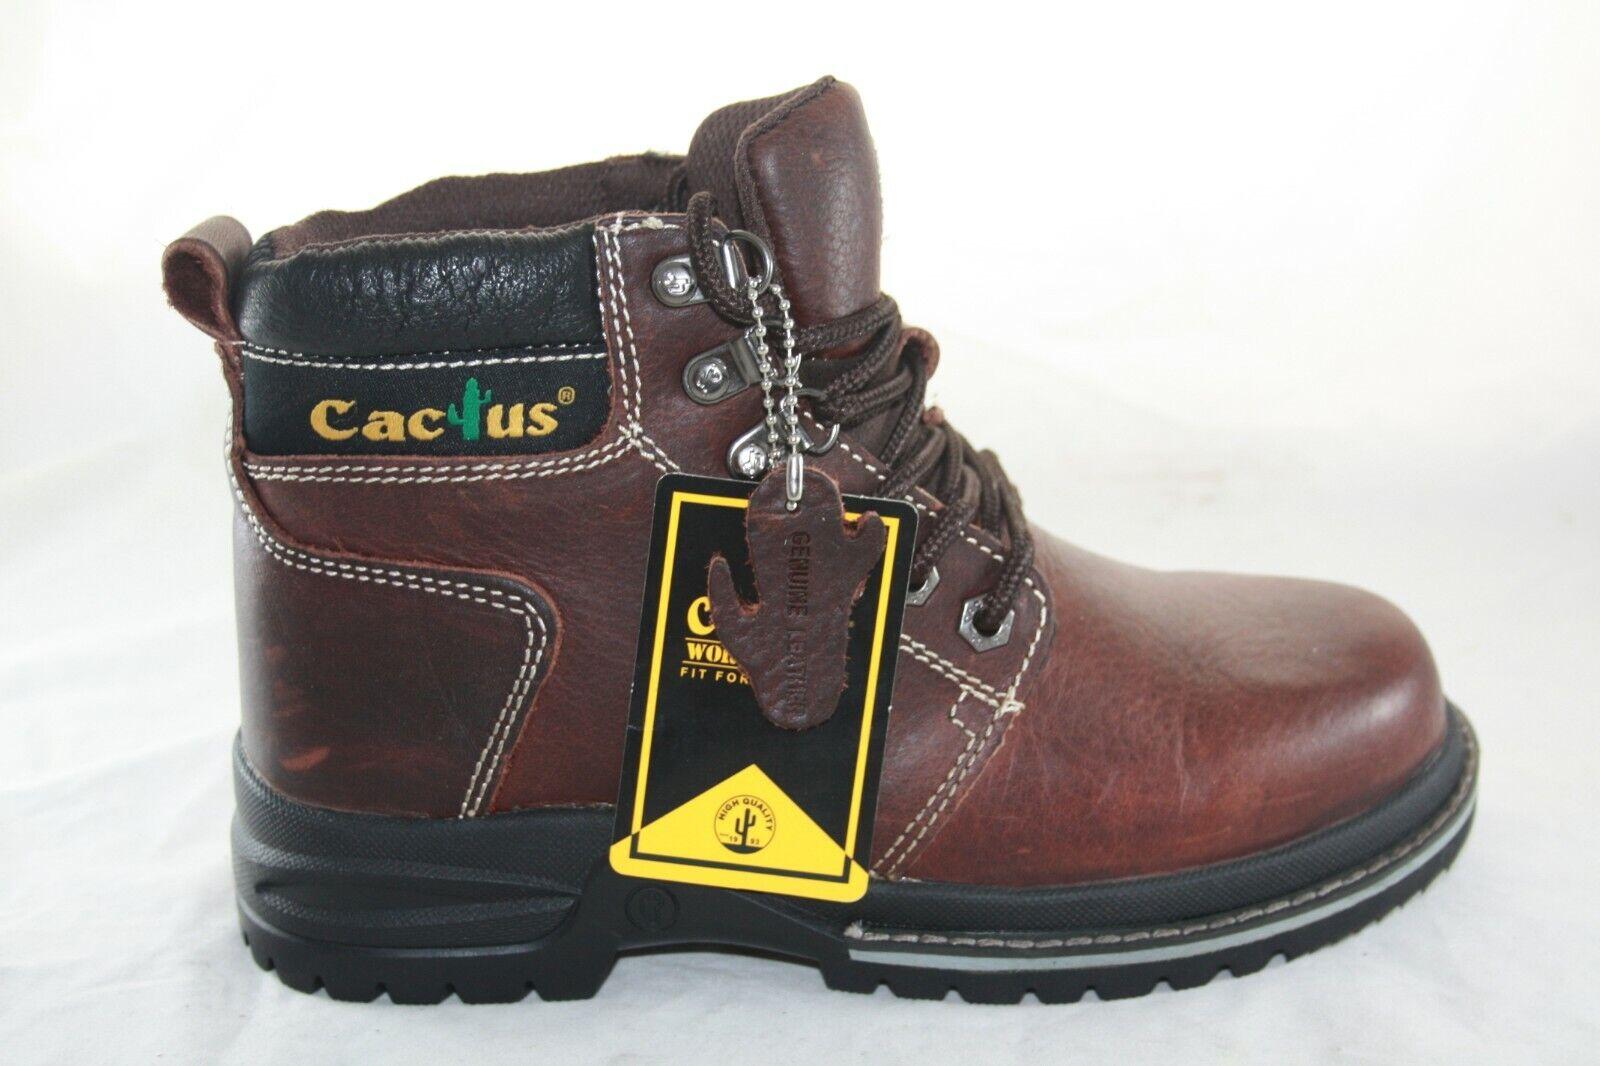 08be3d4afb2 MEN'S CACTUS WORK BOOT 6533 OIL RESISTANT DARK BROWN nolbie6629 ...